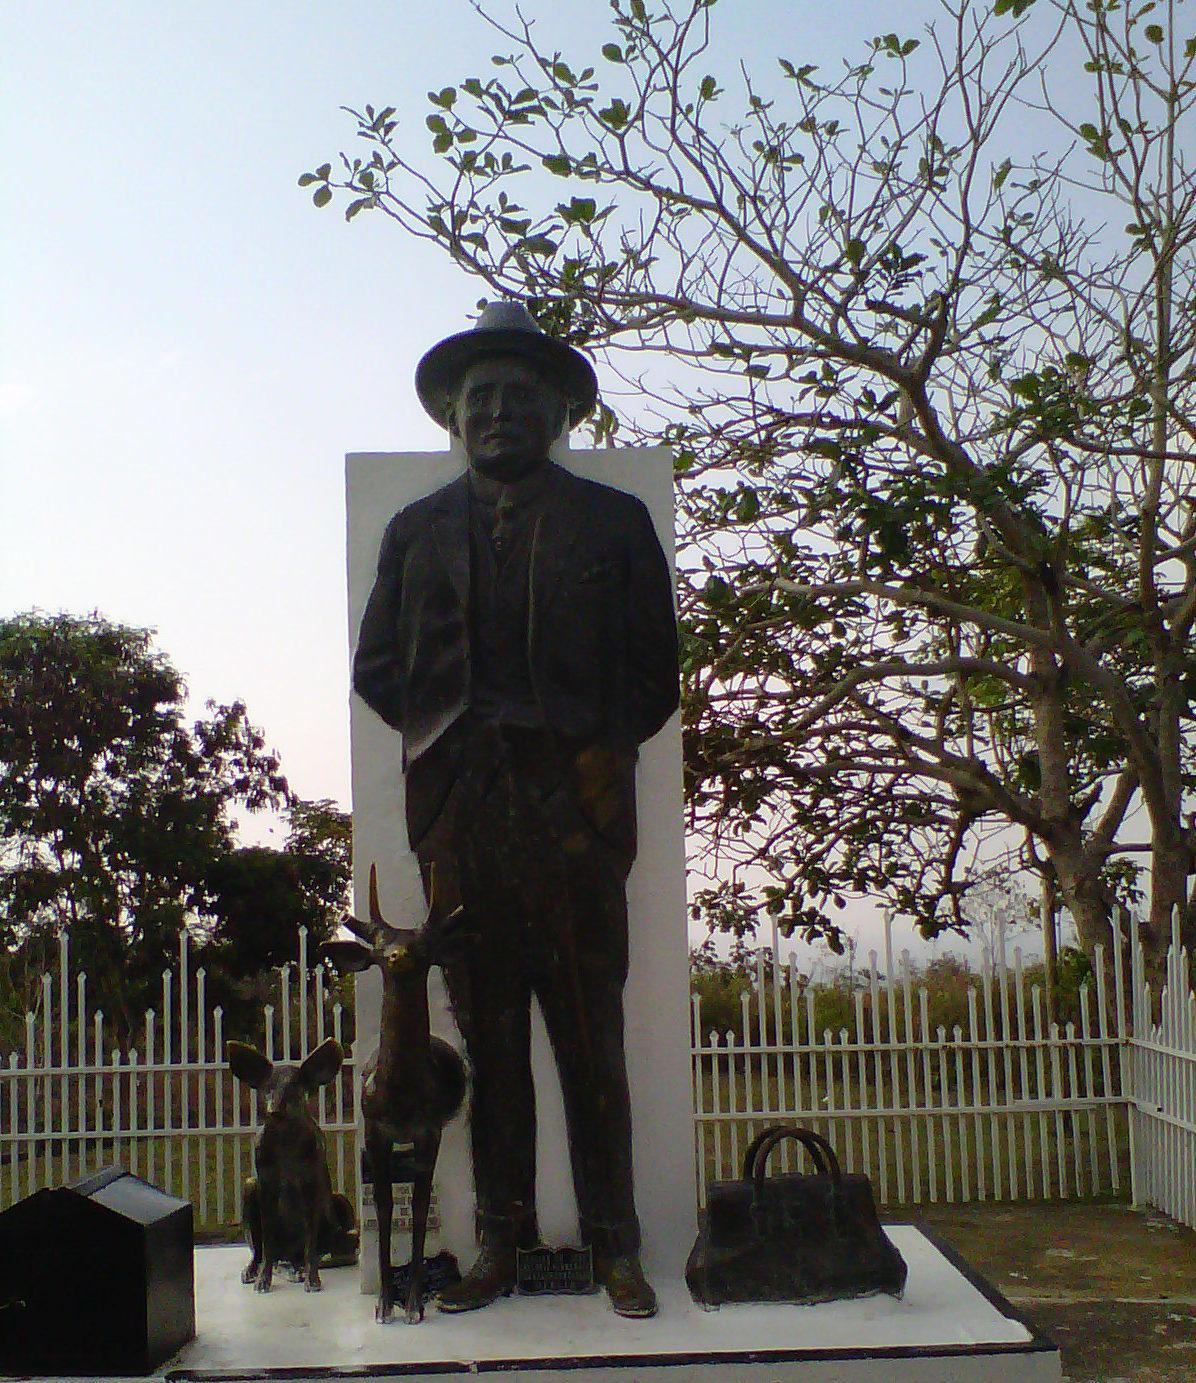 Statue de José Gregorio Hernández, sanctuaire d'Isnotu (Venezuela) @ Wikimedia Commons / Yonny Jose Avila Berrios